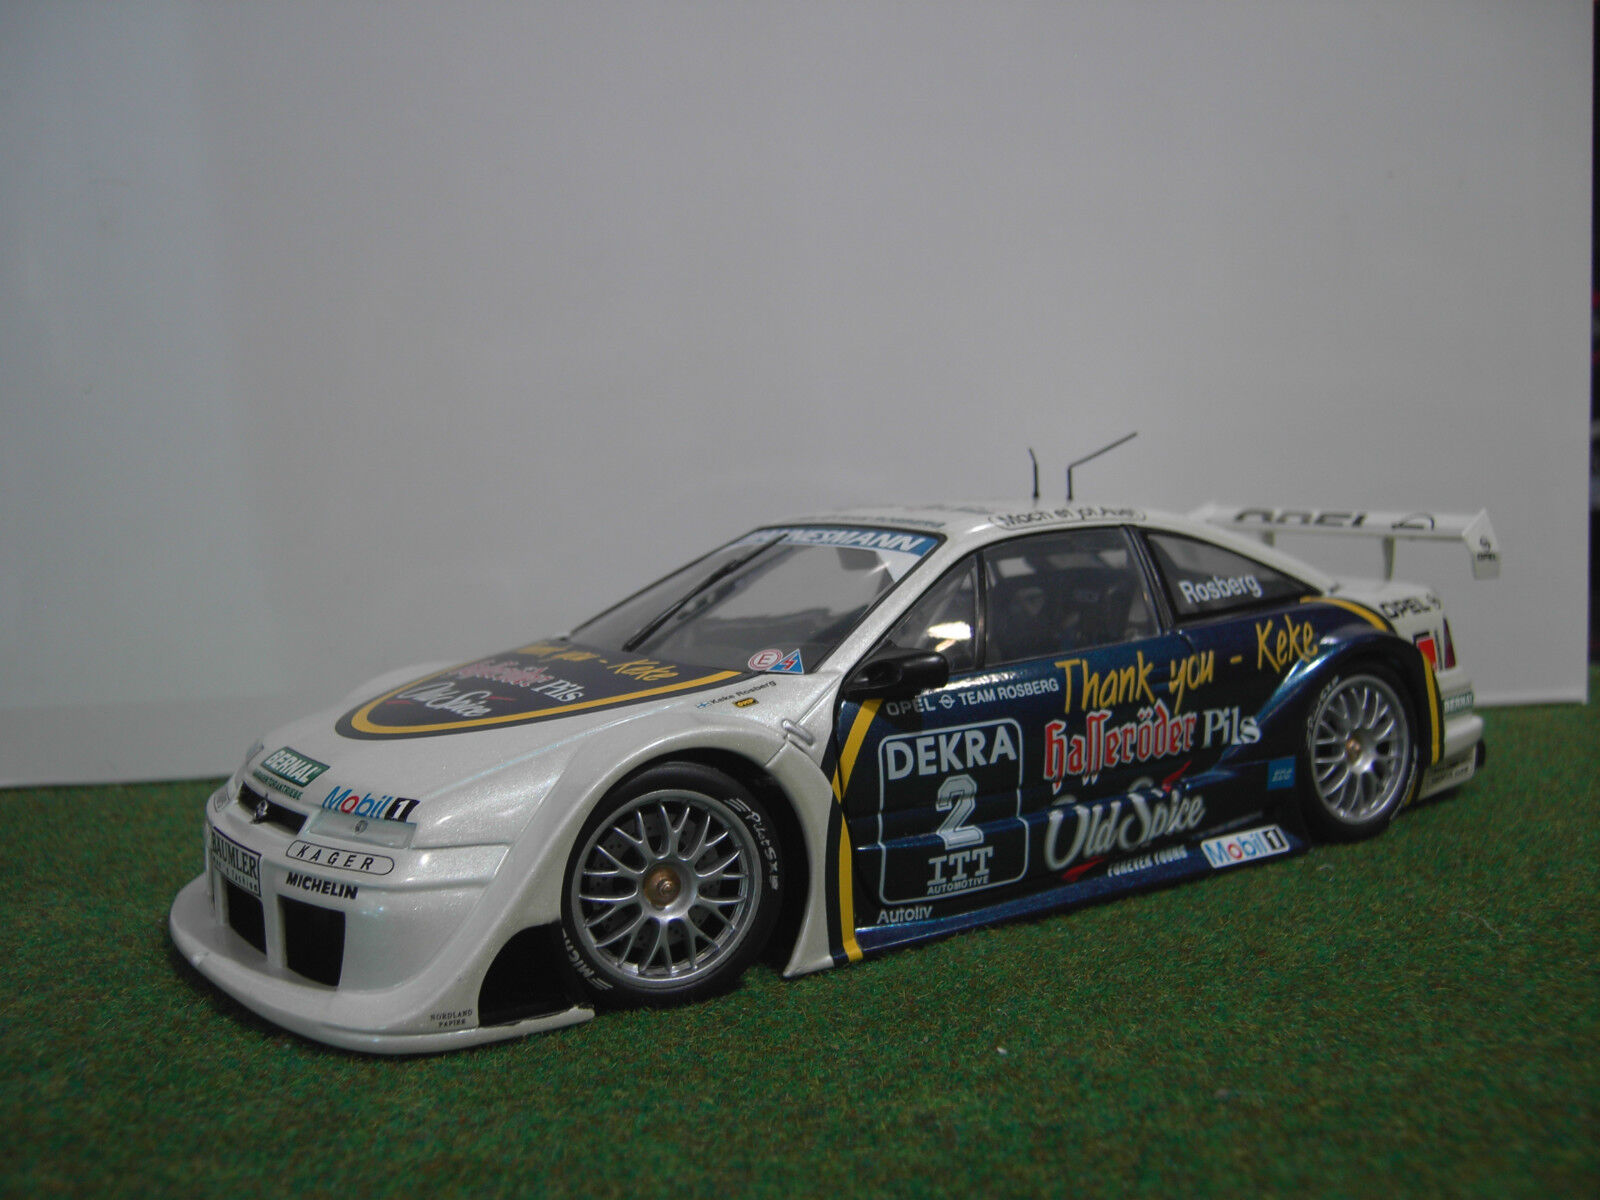 OPEL CALIBRA V6 4x4 DTM Rosberg thank you Keke UT MODELS 1 18 voiture miniature